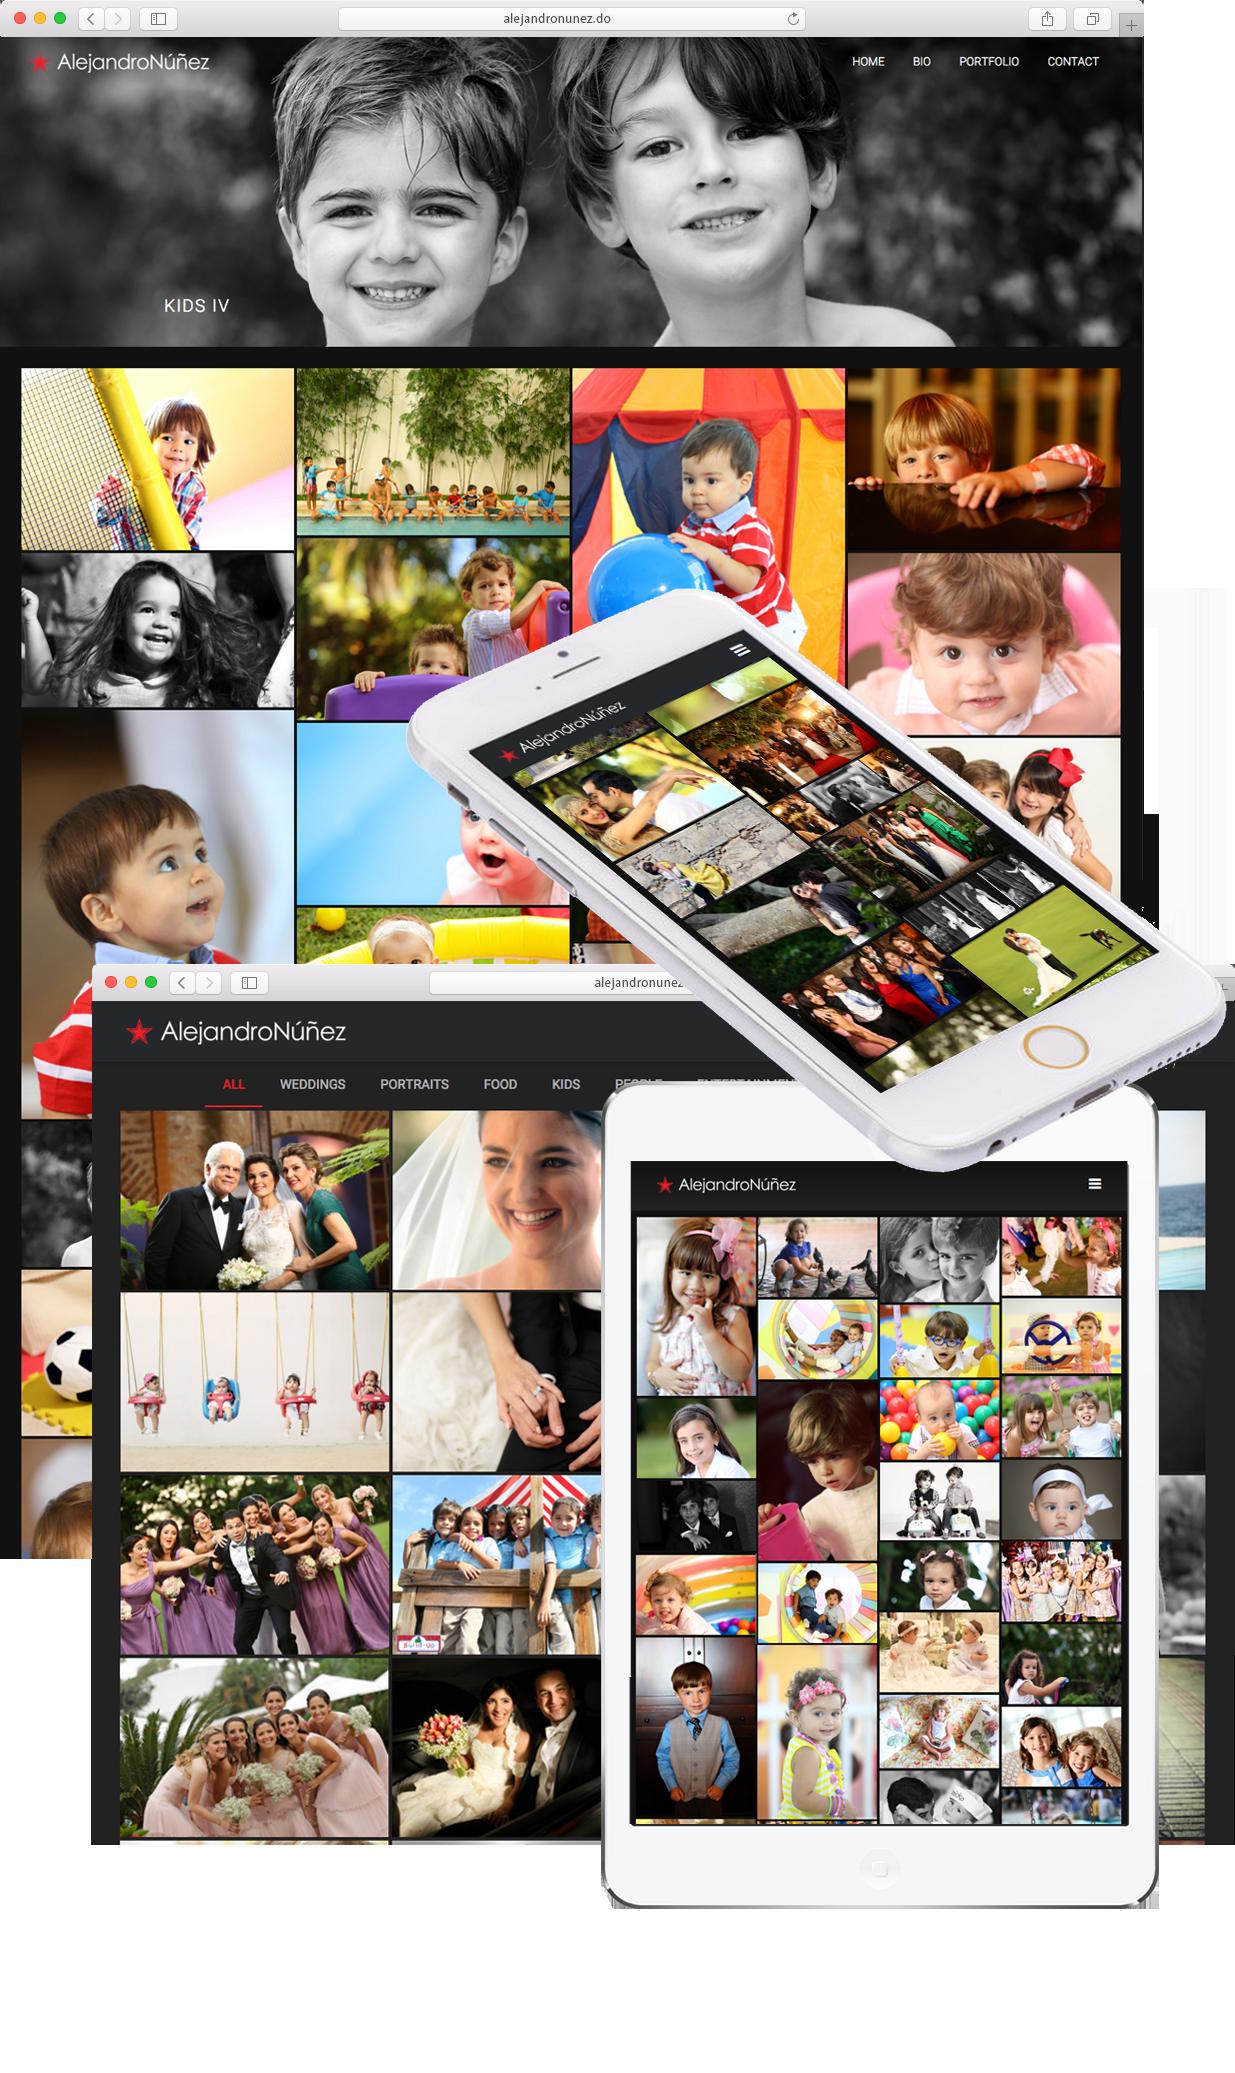 Diseño de página web paa fotógrafo Alejandro Núñez en Wordpress